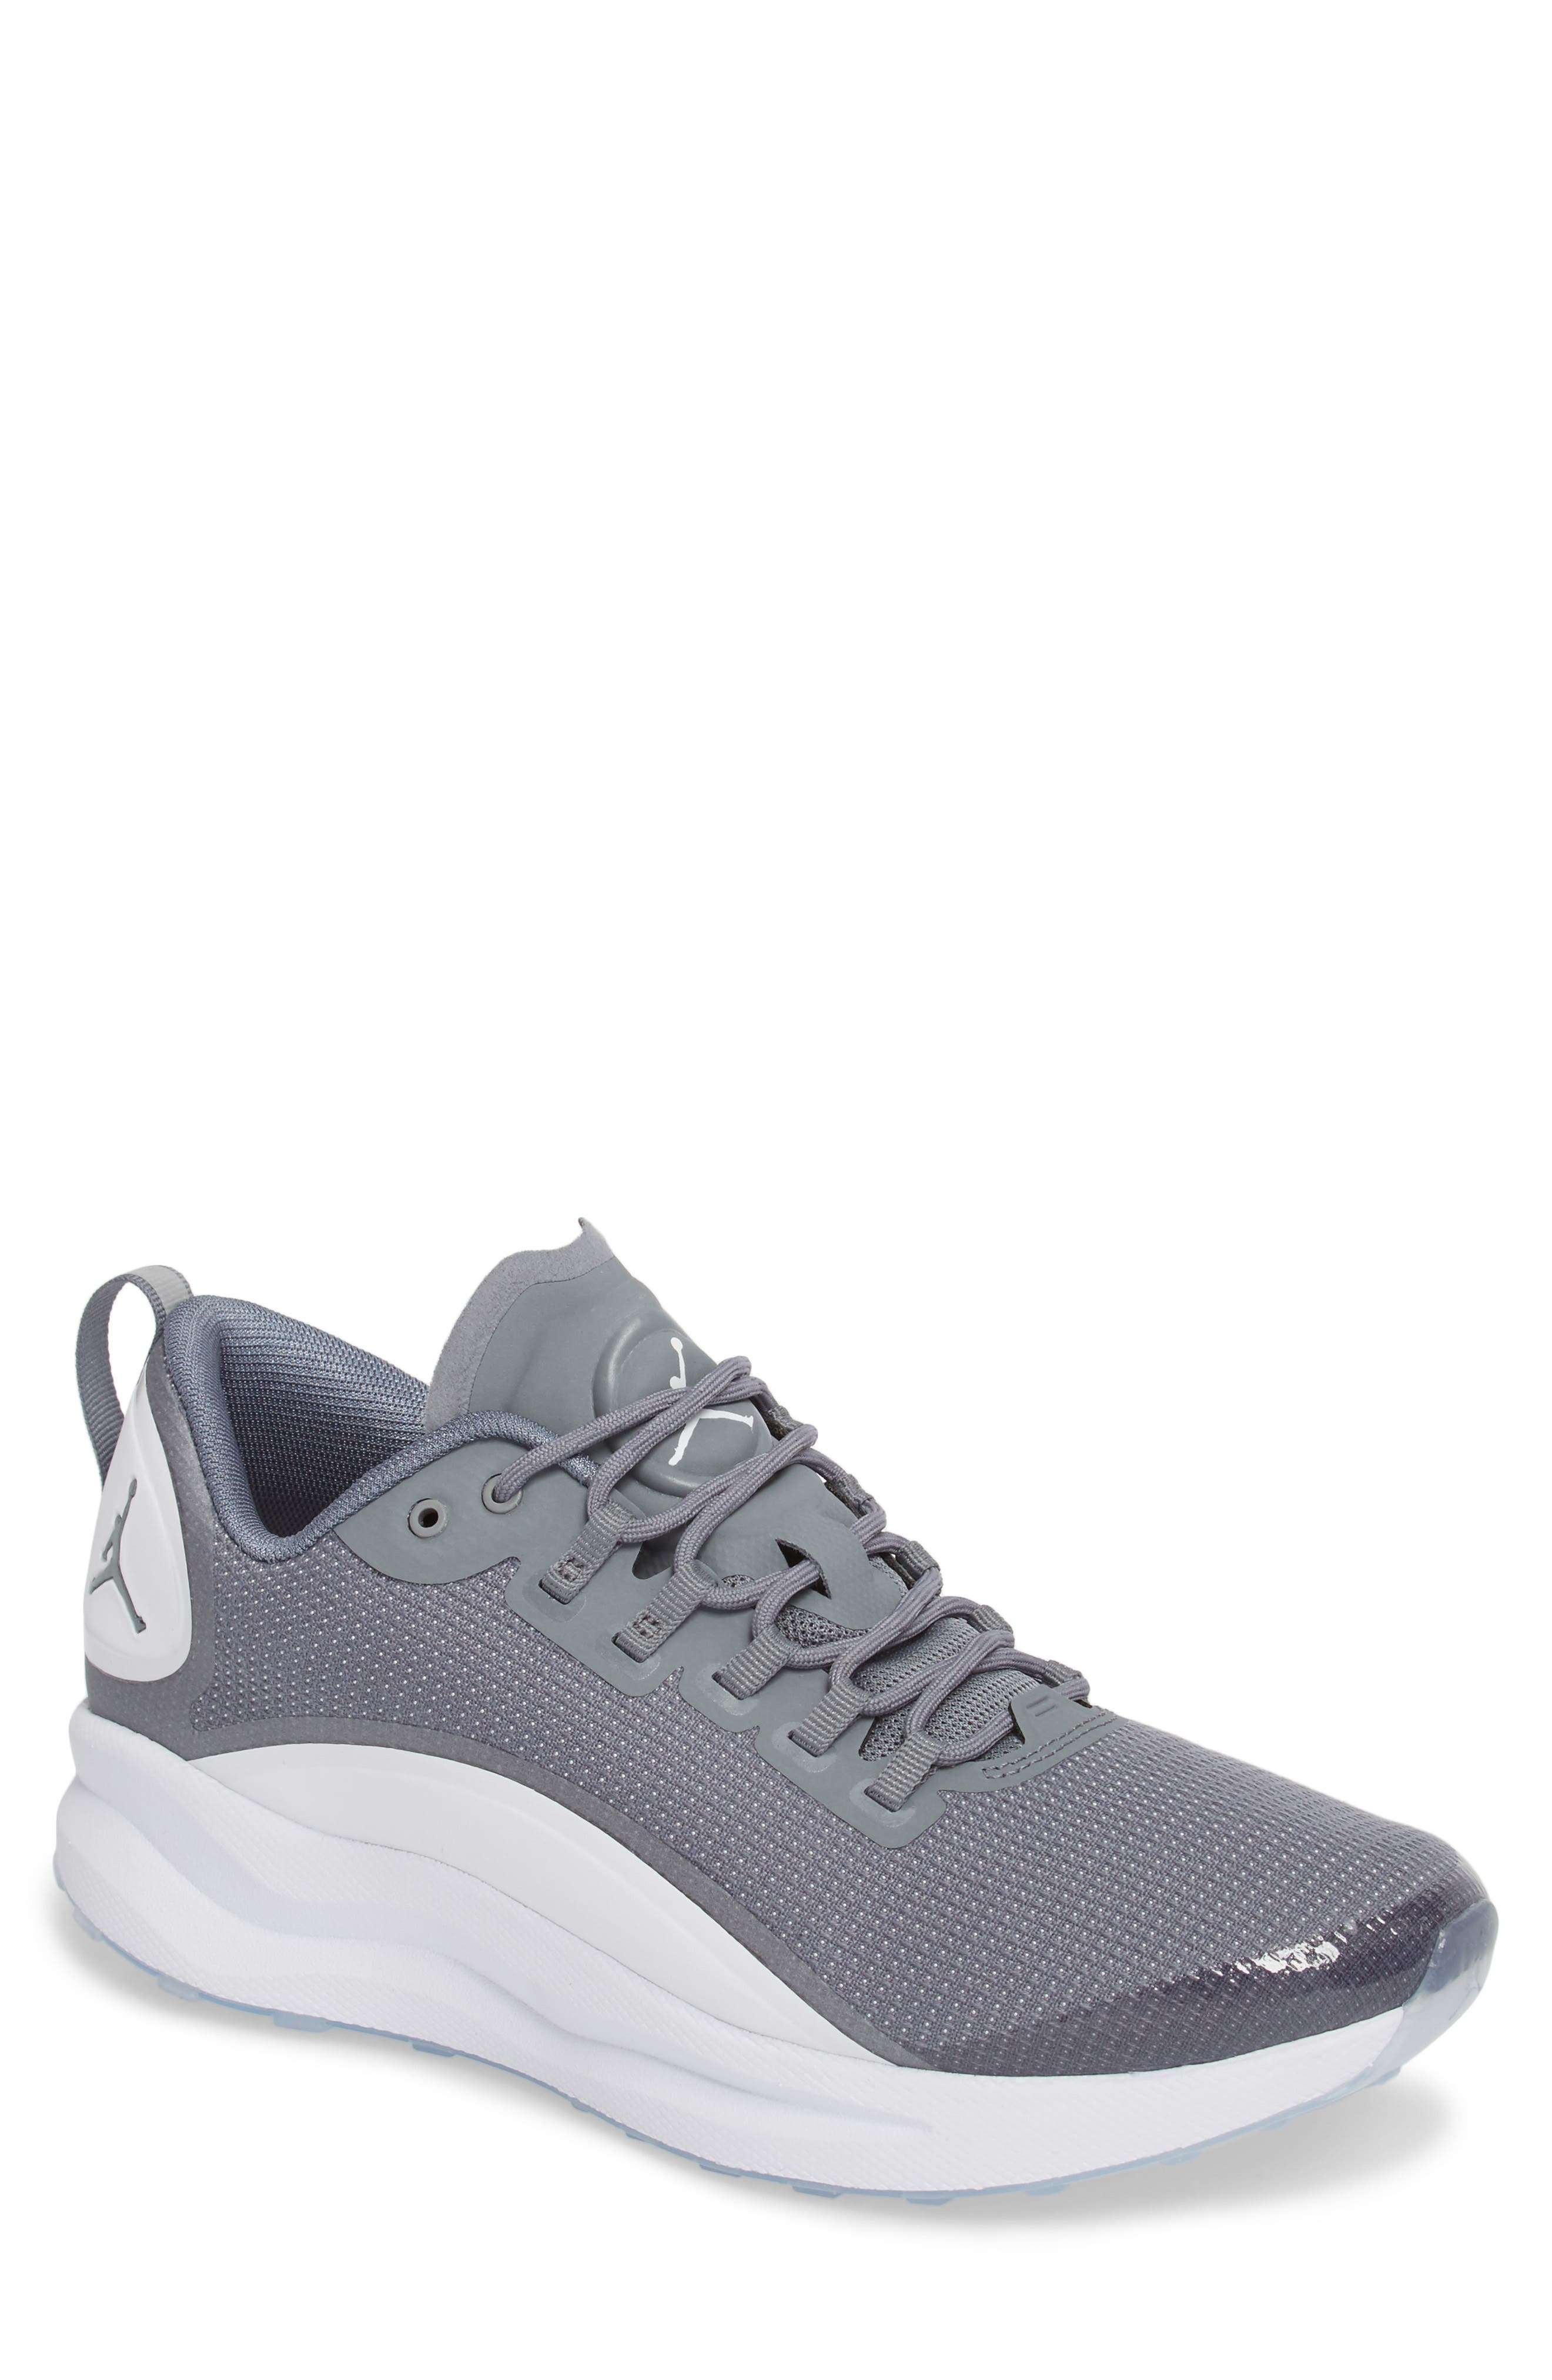 Nike Jordan Zoom Tenacity Running Shoe In Cool Grey  White  Medium Grey 3386f8640